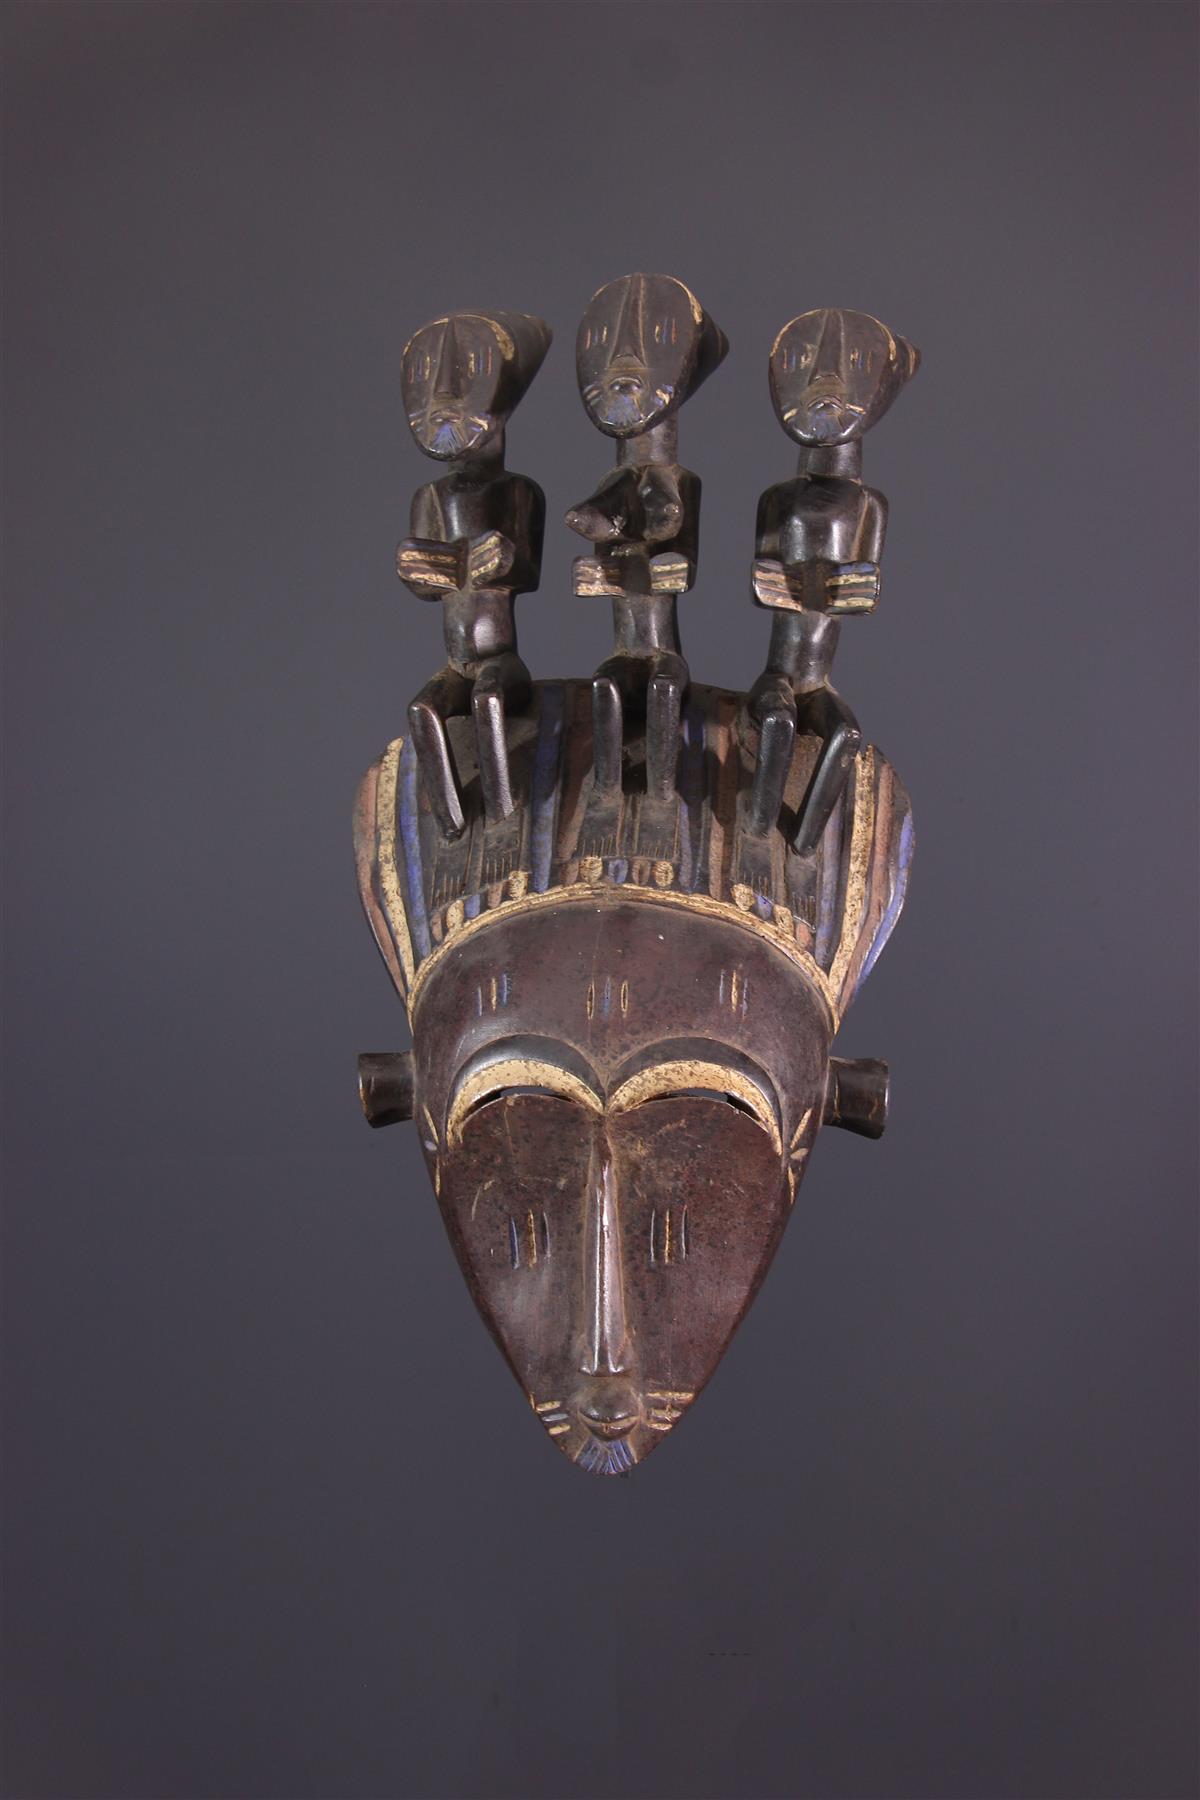 Koulango Mask - African art